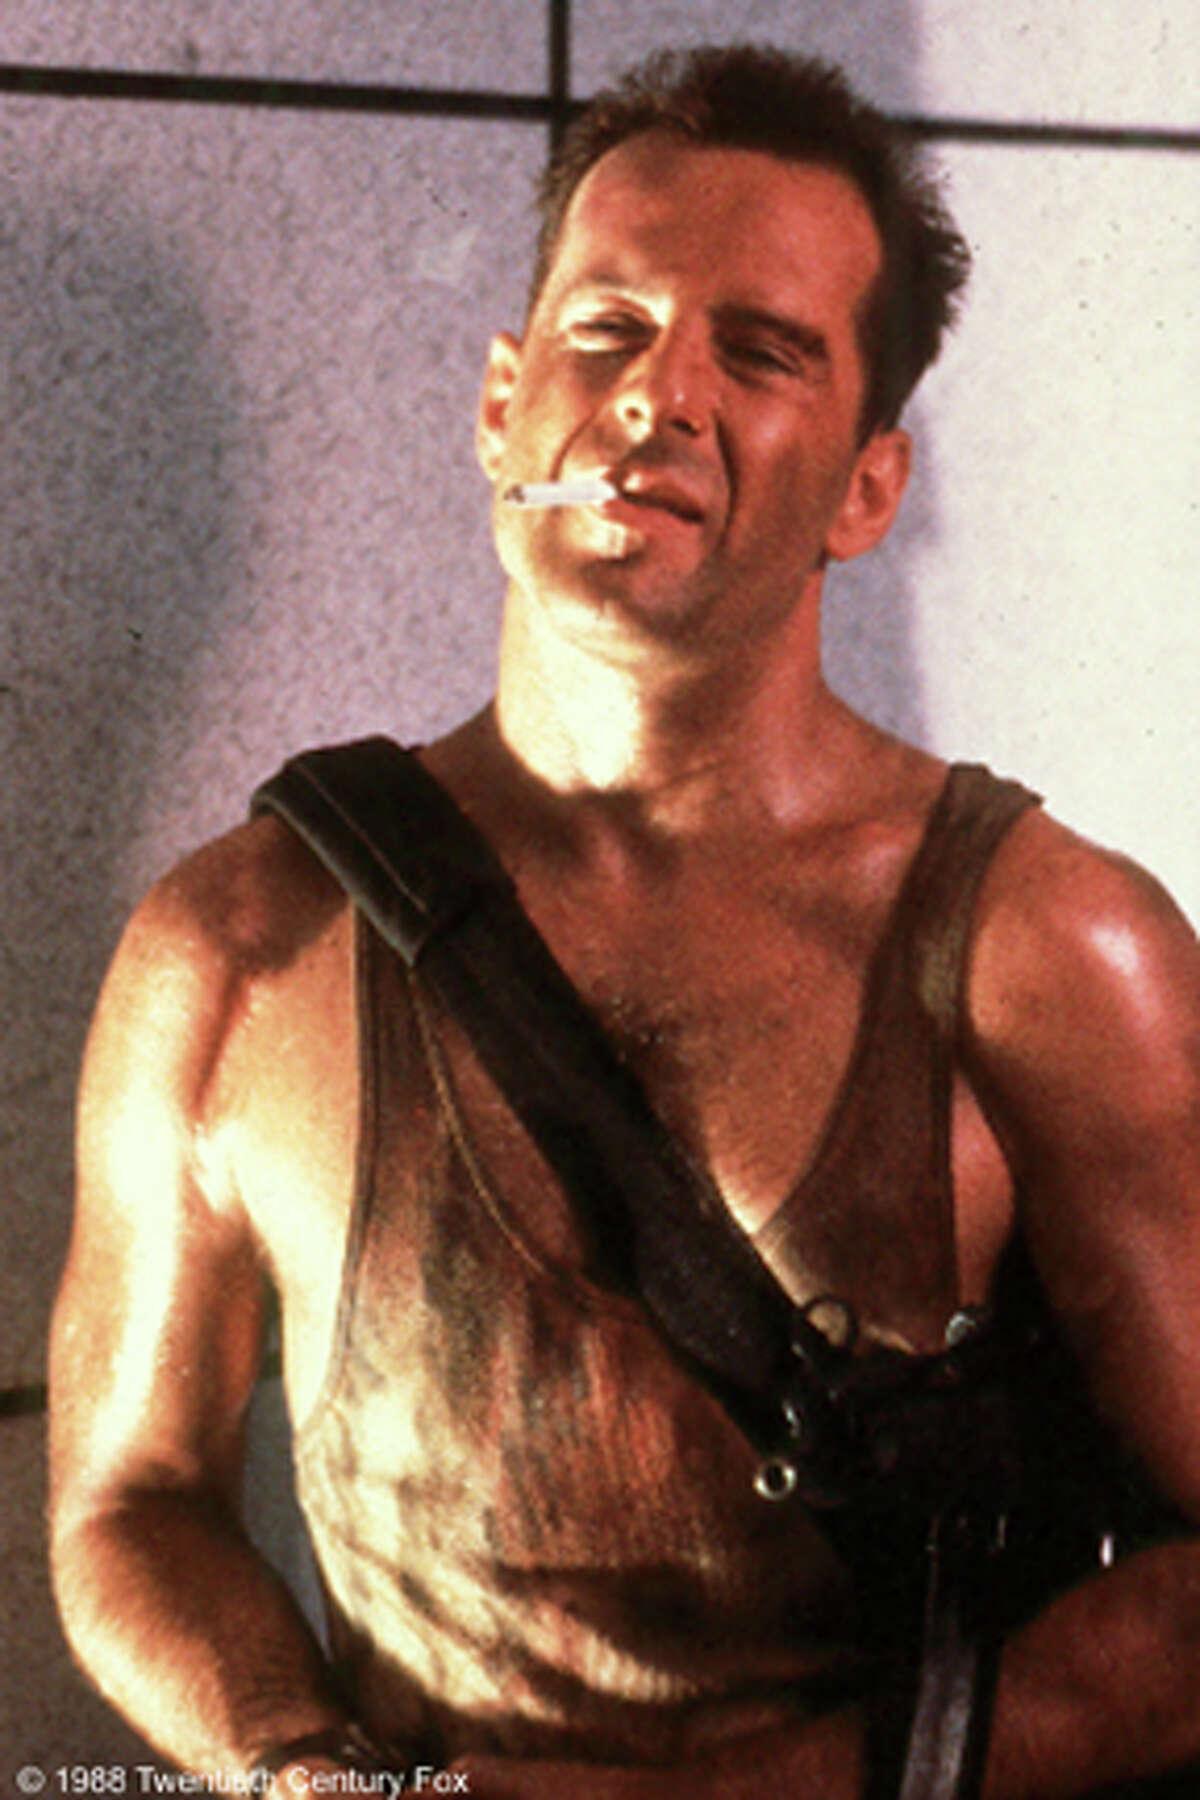 Bruce Willis played